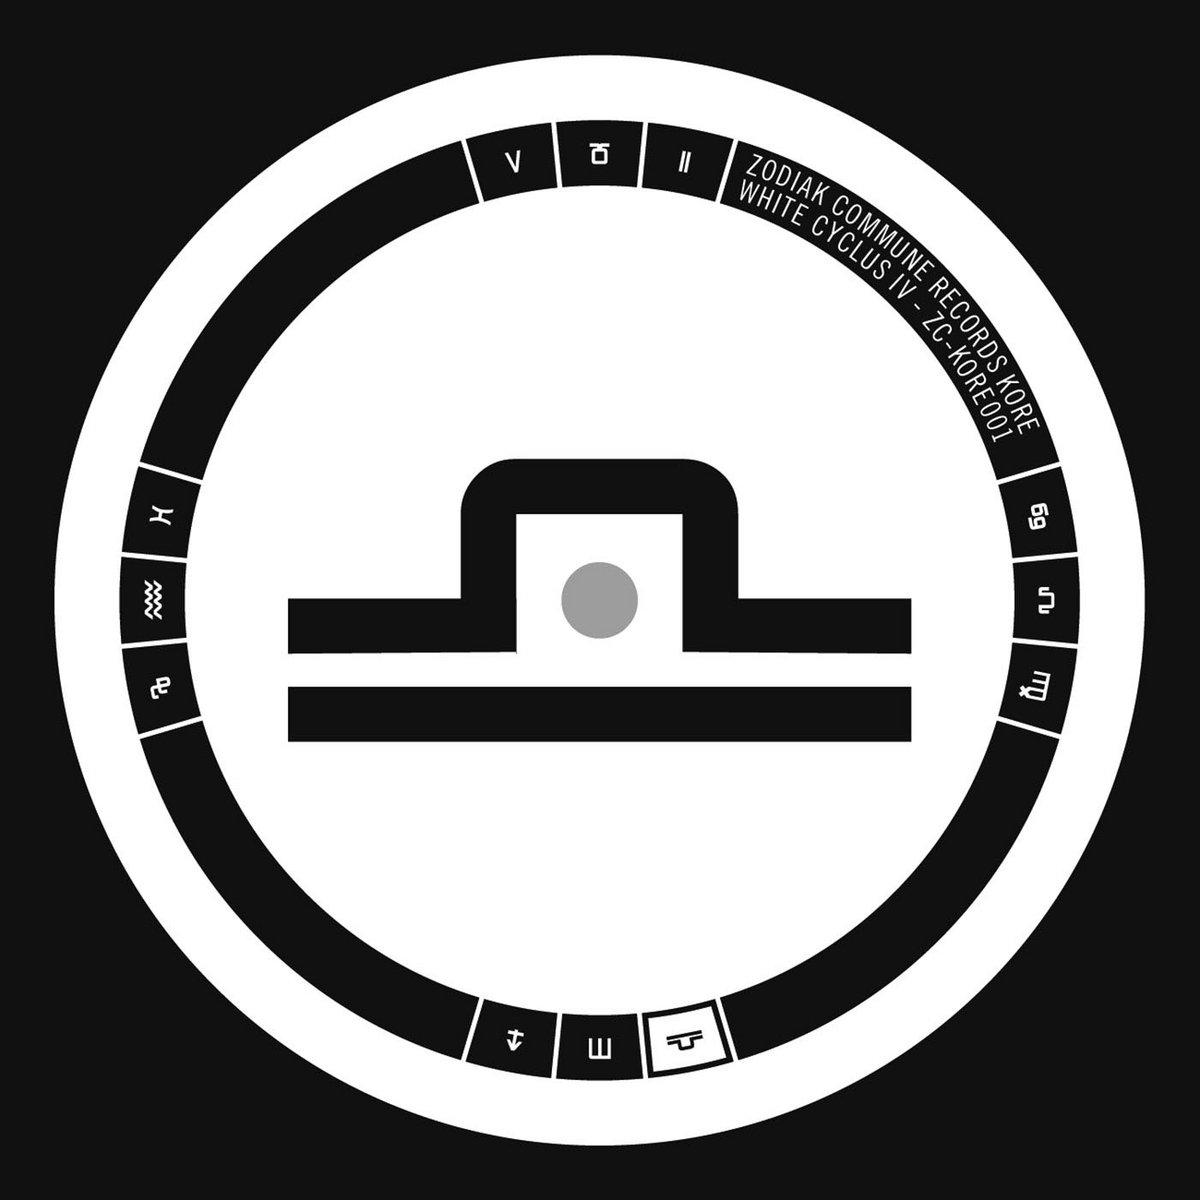 Ecto Zodiak Commune Records